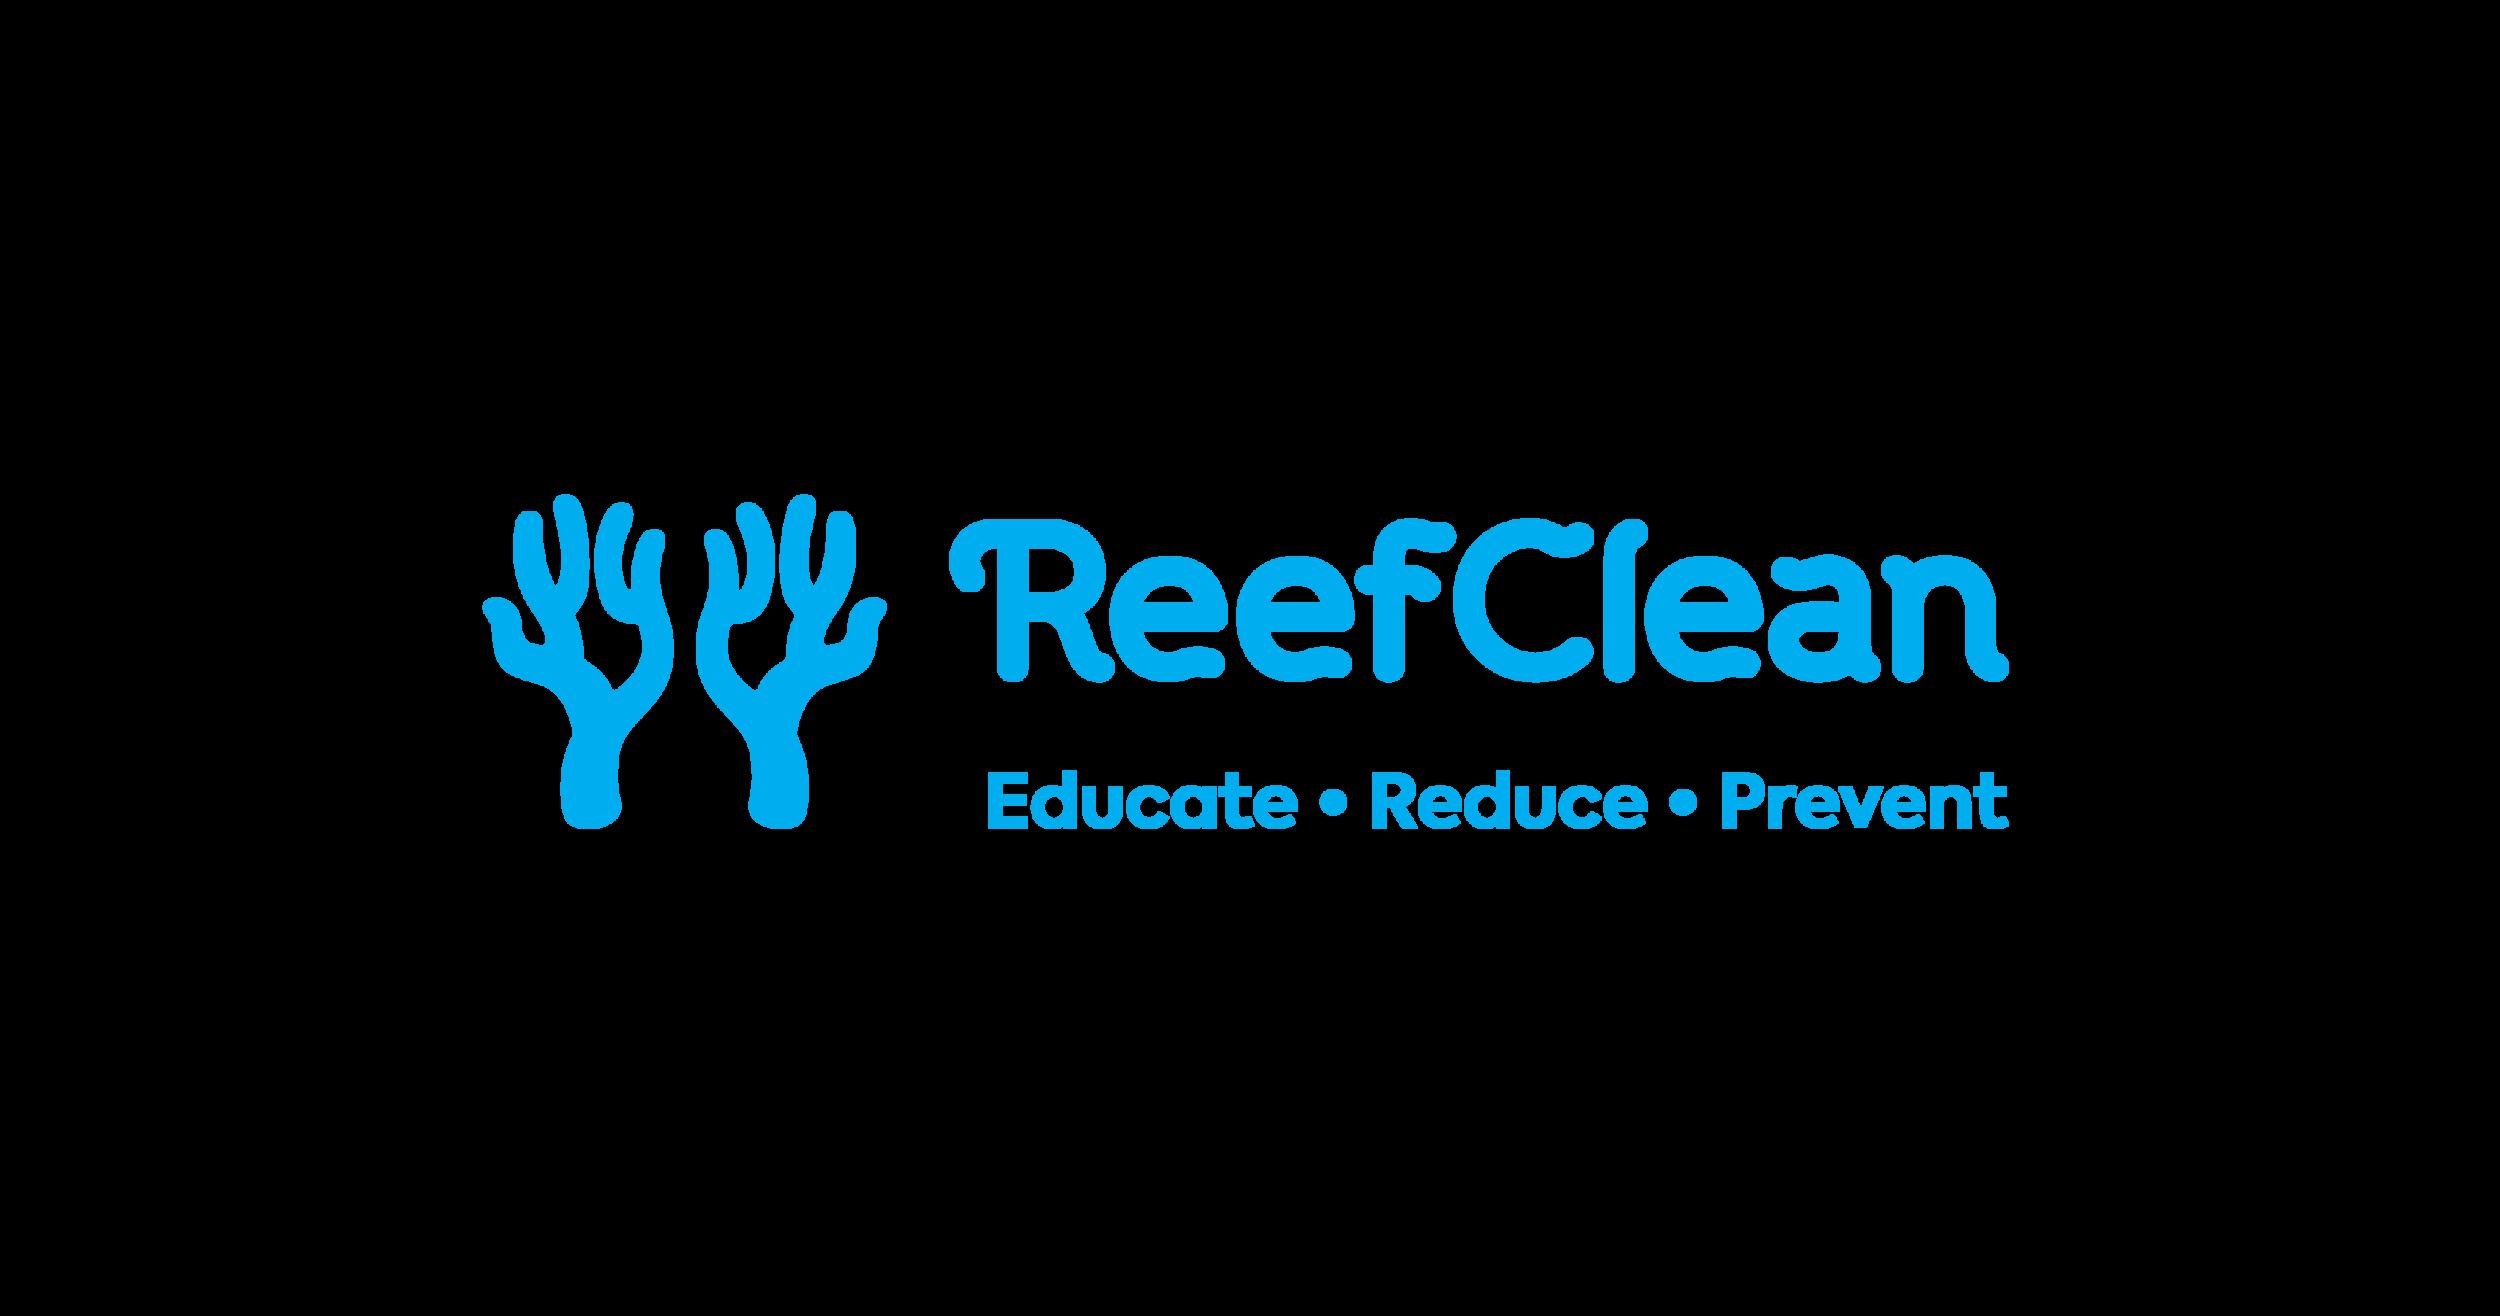 reefClean.landscape.logo.CMYK (2).png